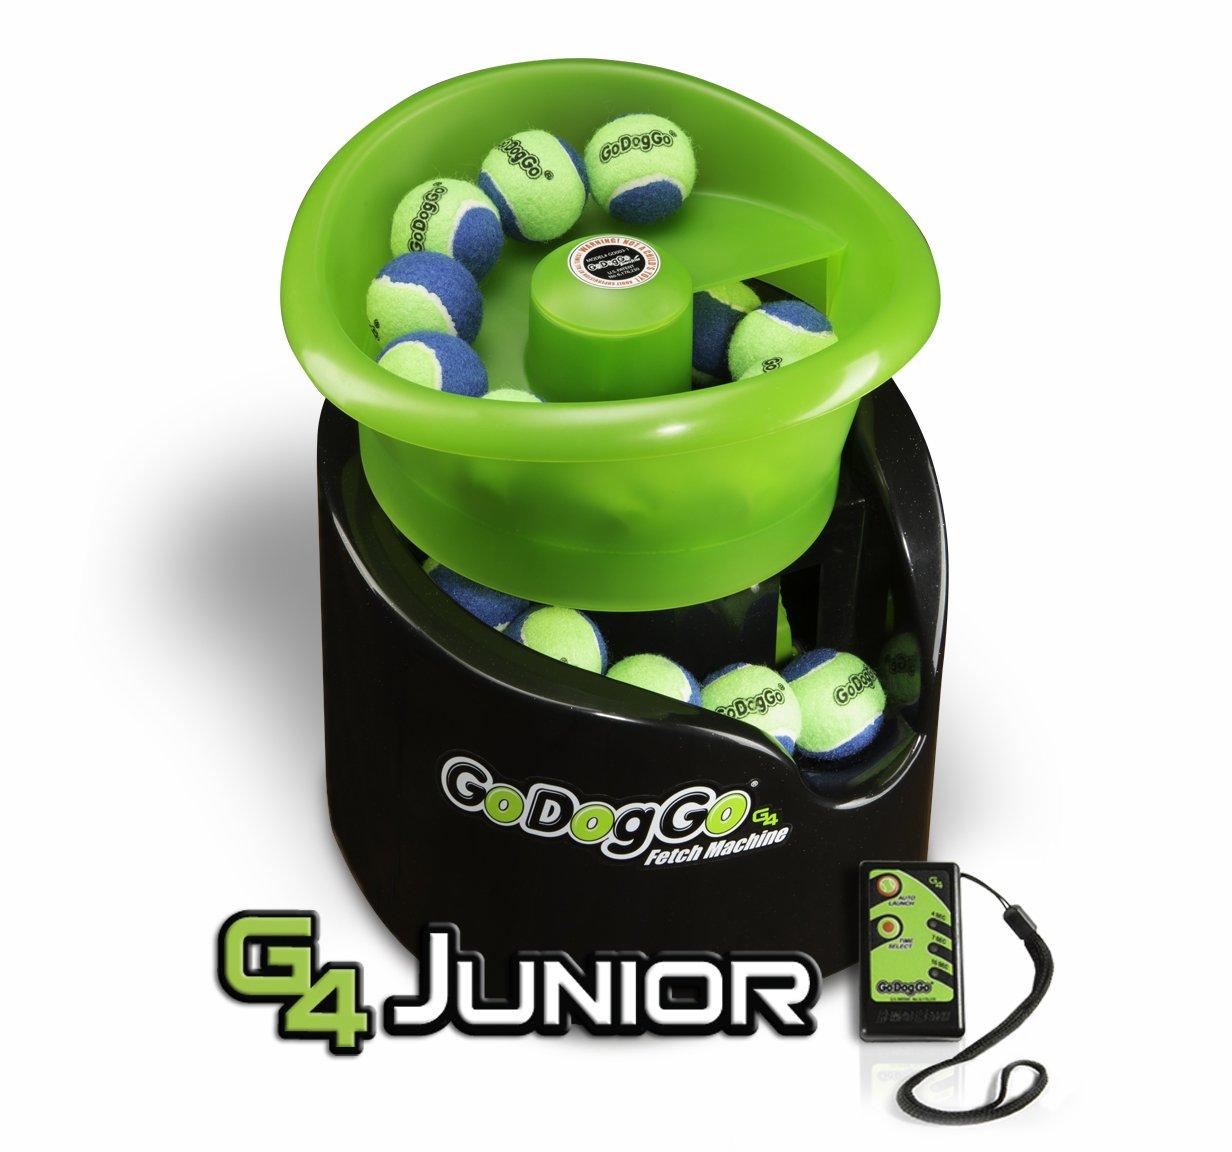 GoDogGo Junior Maschine abrufen